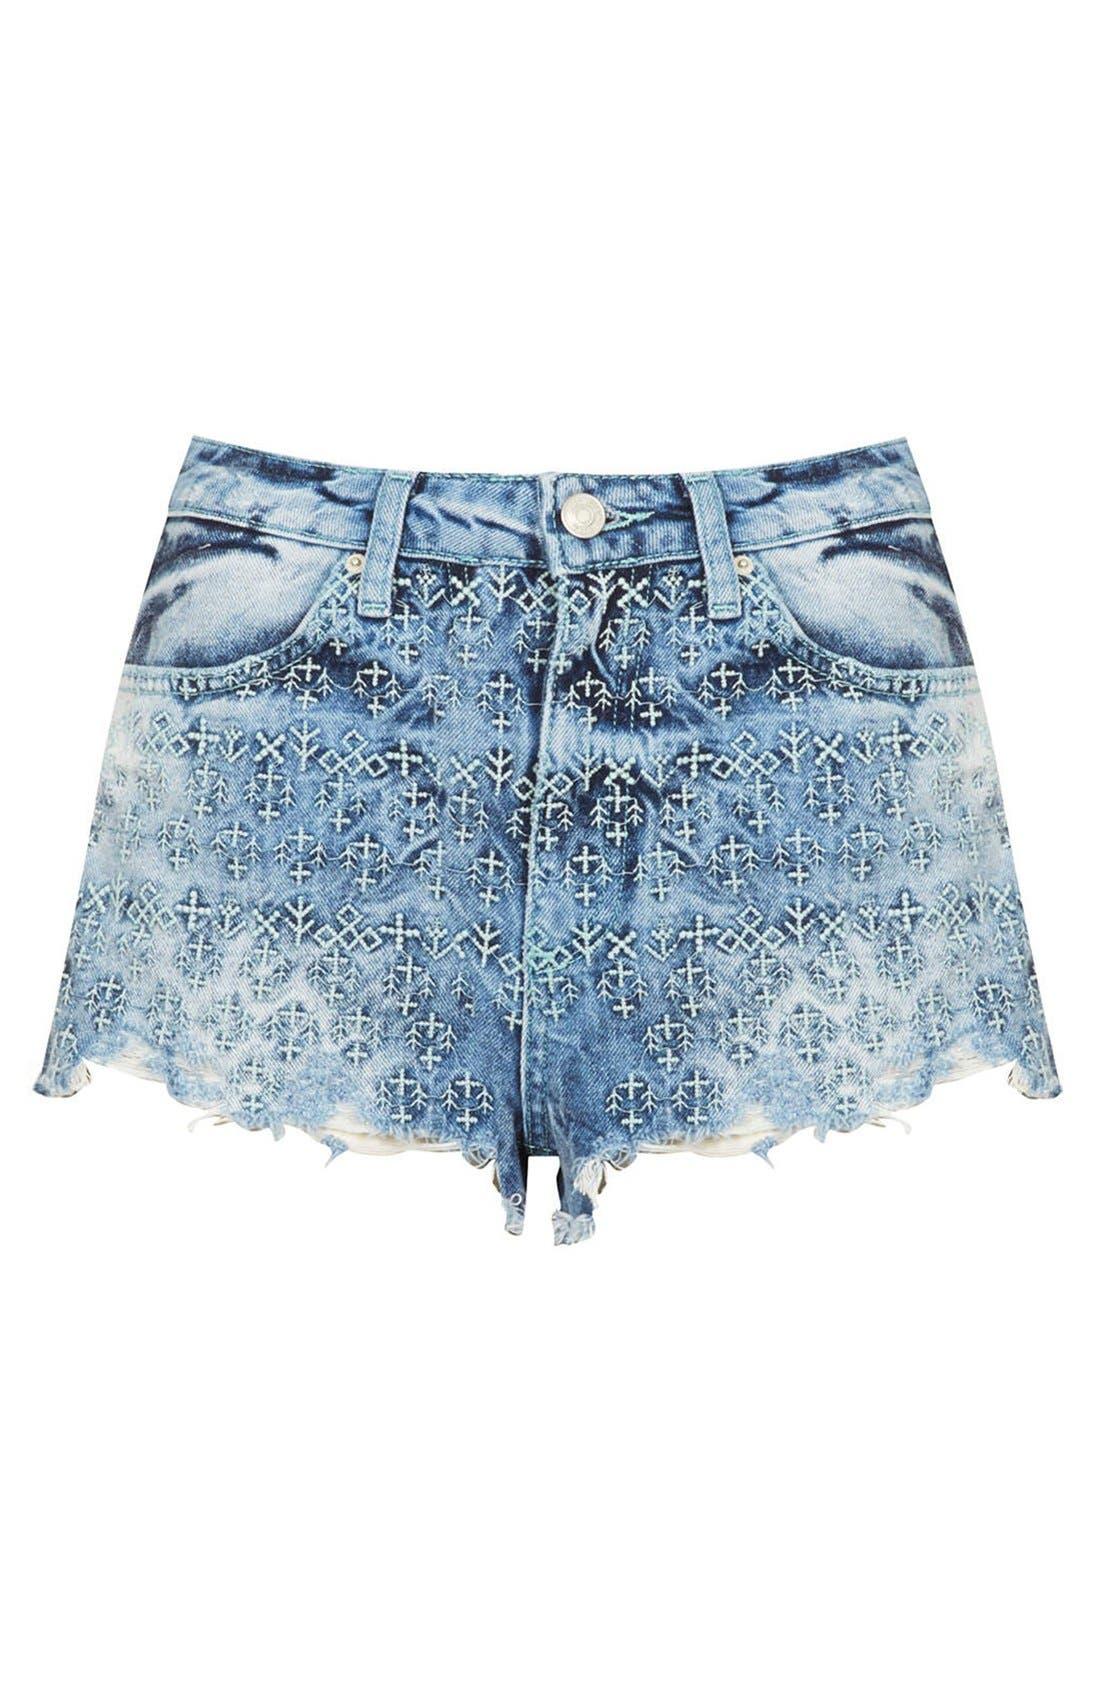 Alternate Image 3  - Topshop Moto 'Folk Law' Embroidered Denim Shorts